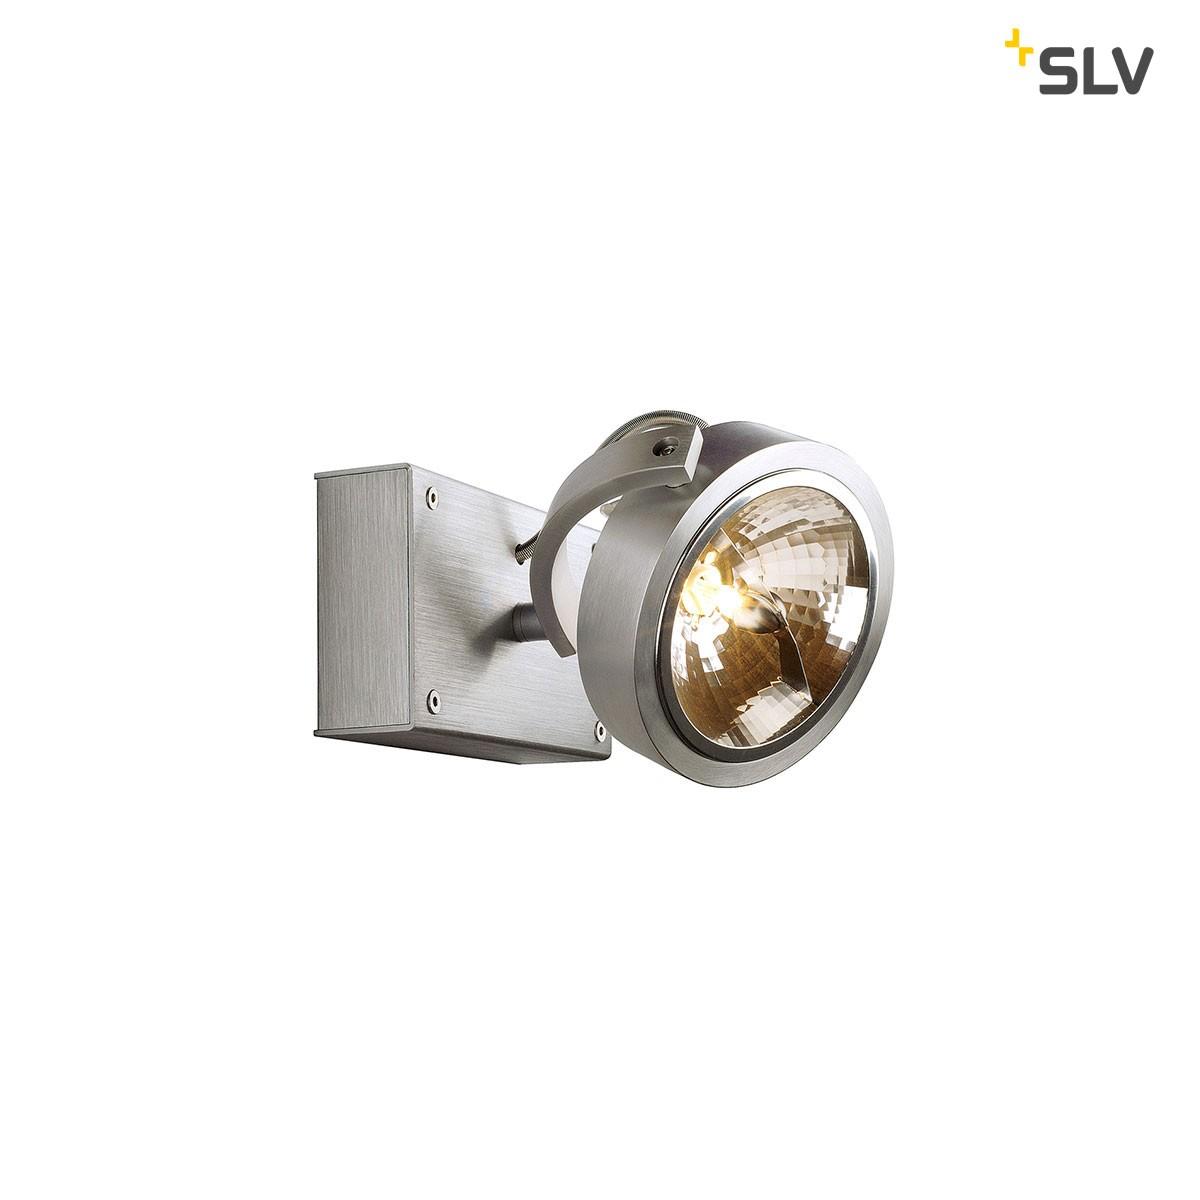 SLV Kalu Wand- / Deckenleuchte, 1-flg., Aluminium gebürstet